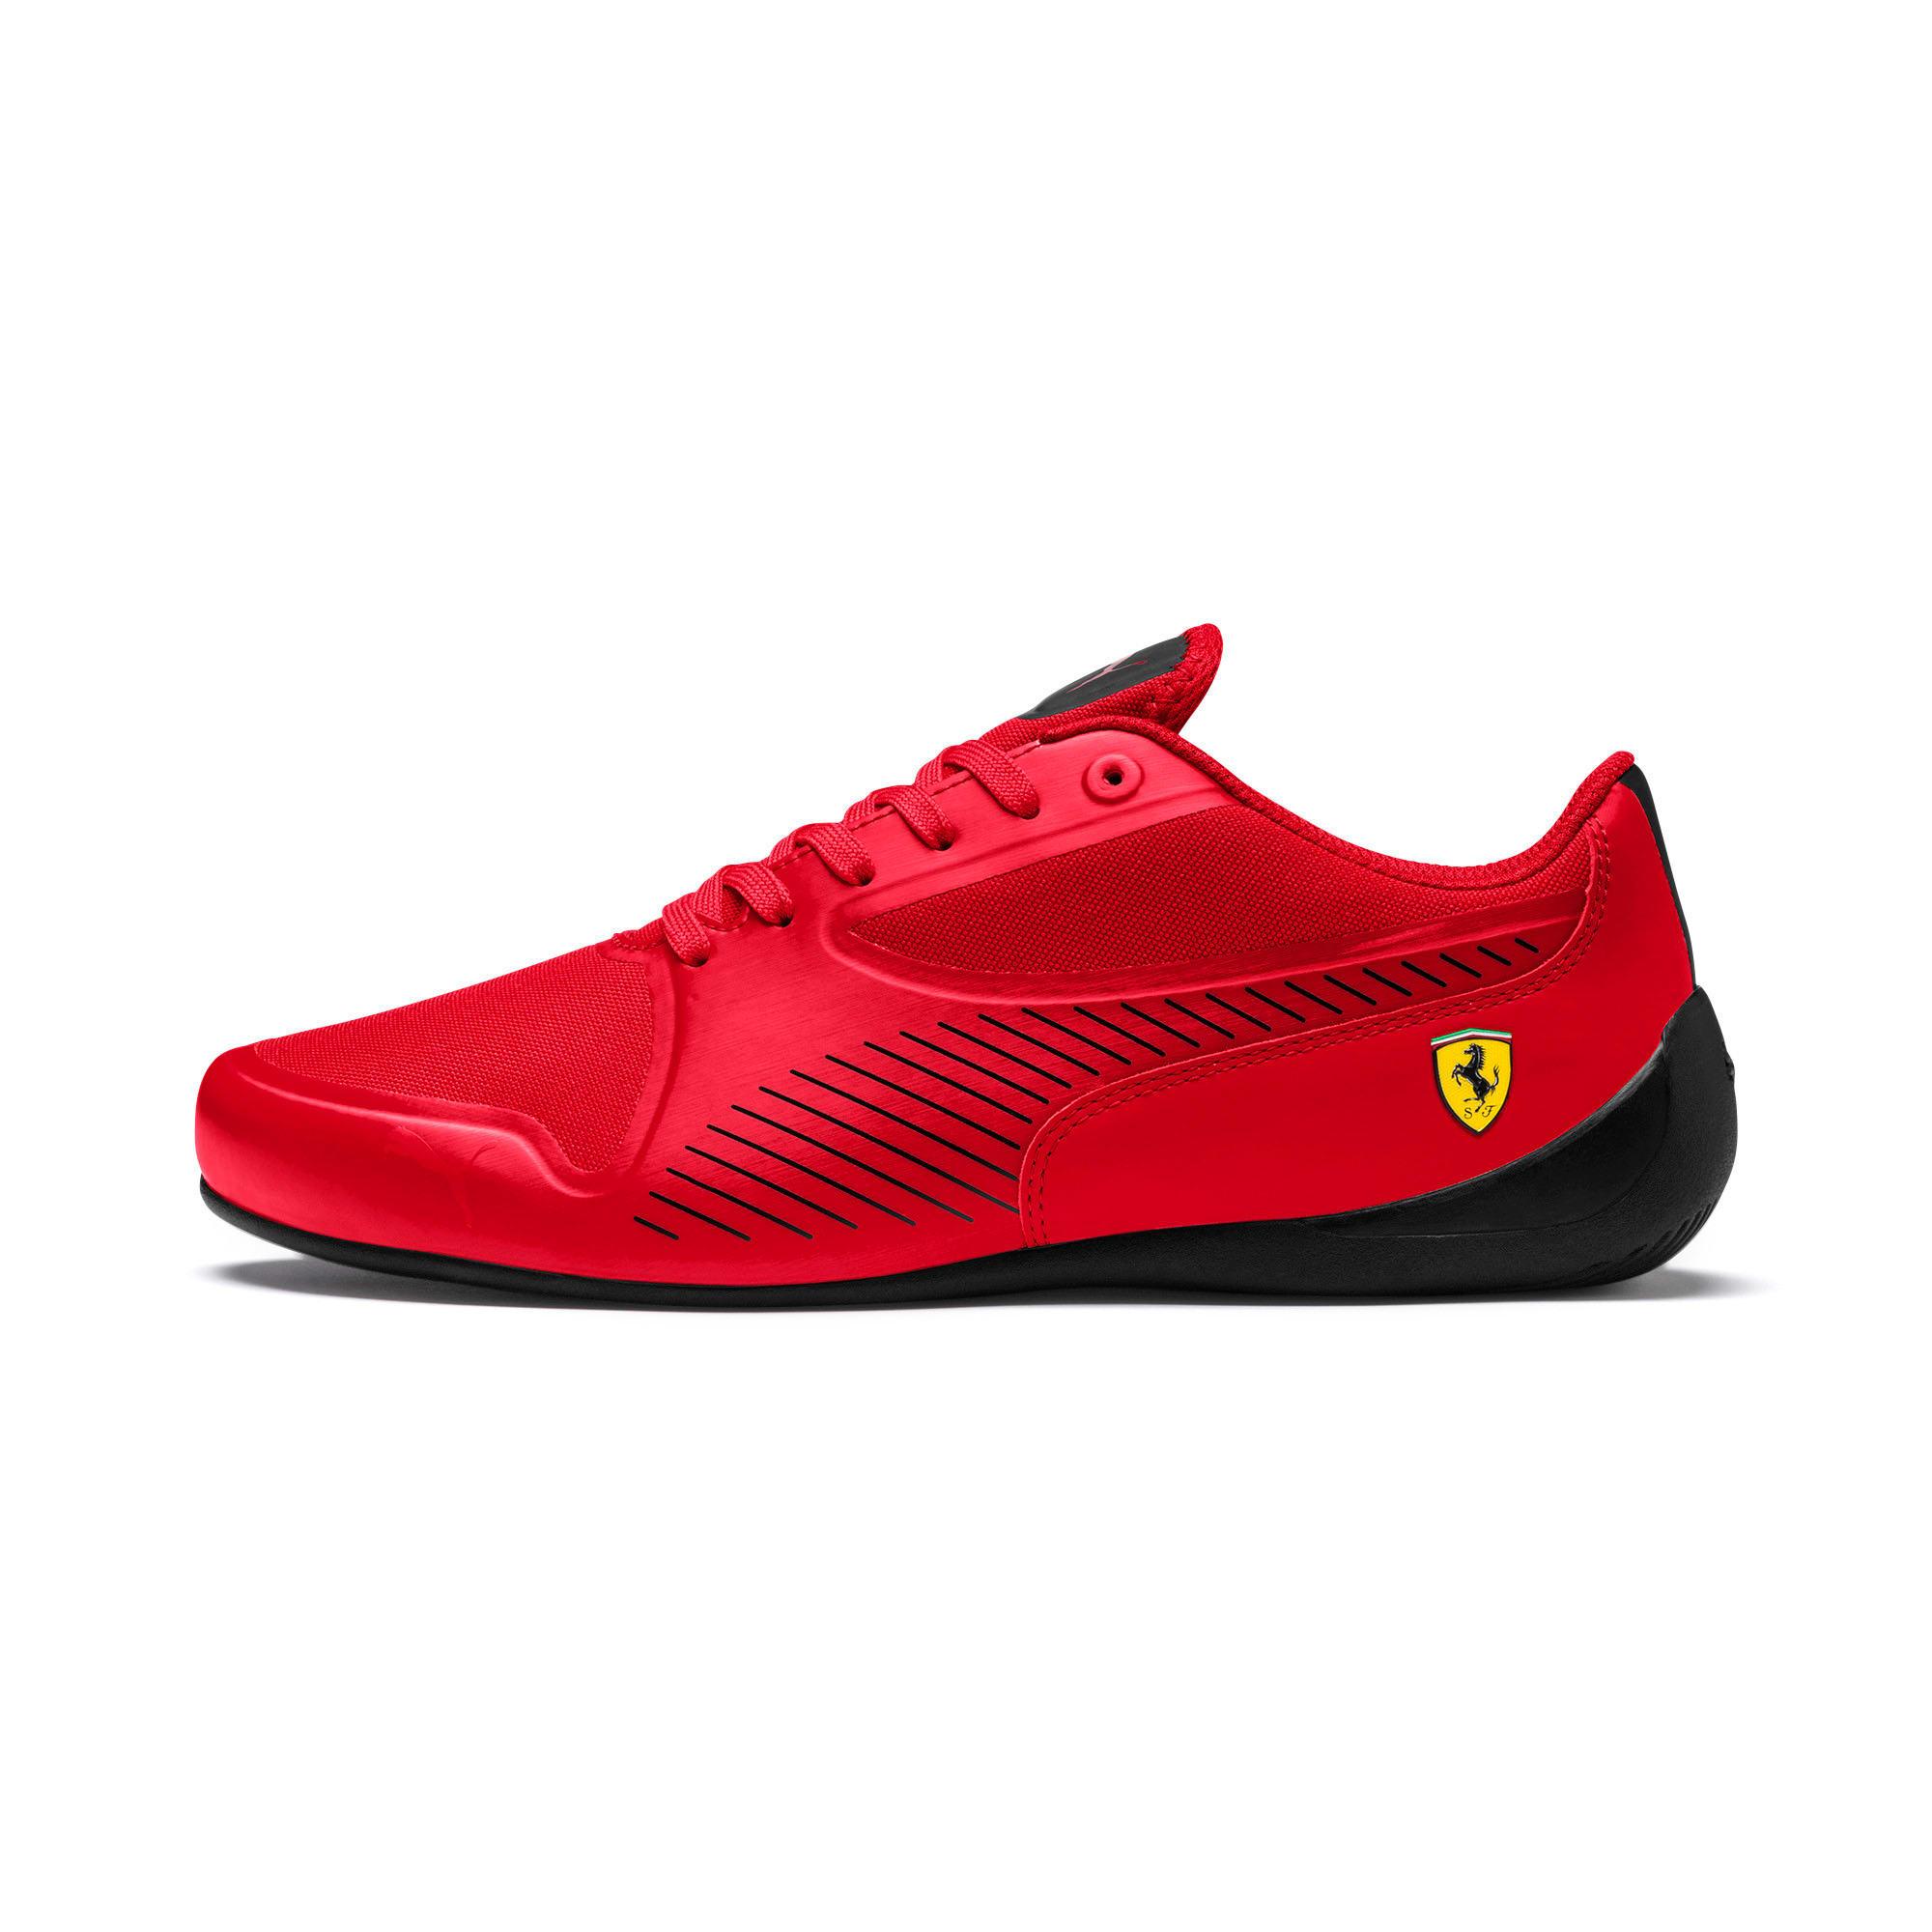 Thumbnail 1 of Scuderia Ferrari Drift Cat 7 Ultra Shoes, Rosso Corsa-Puma Black, medium